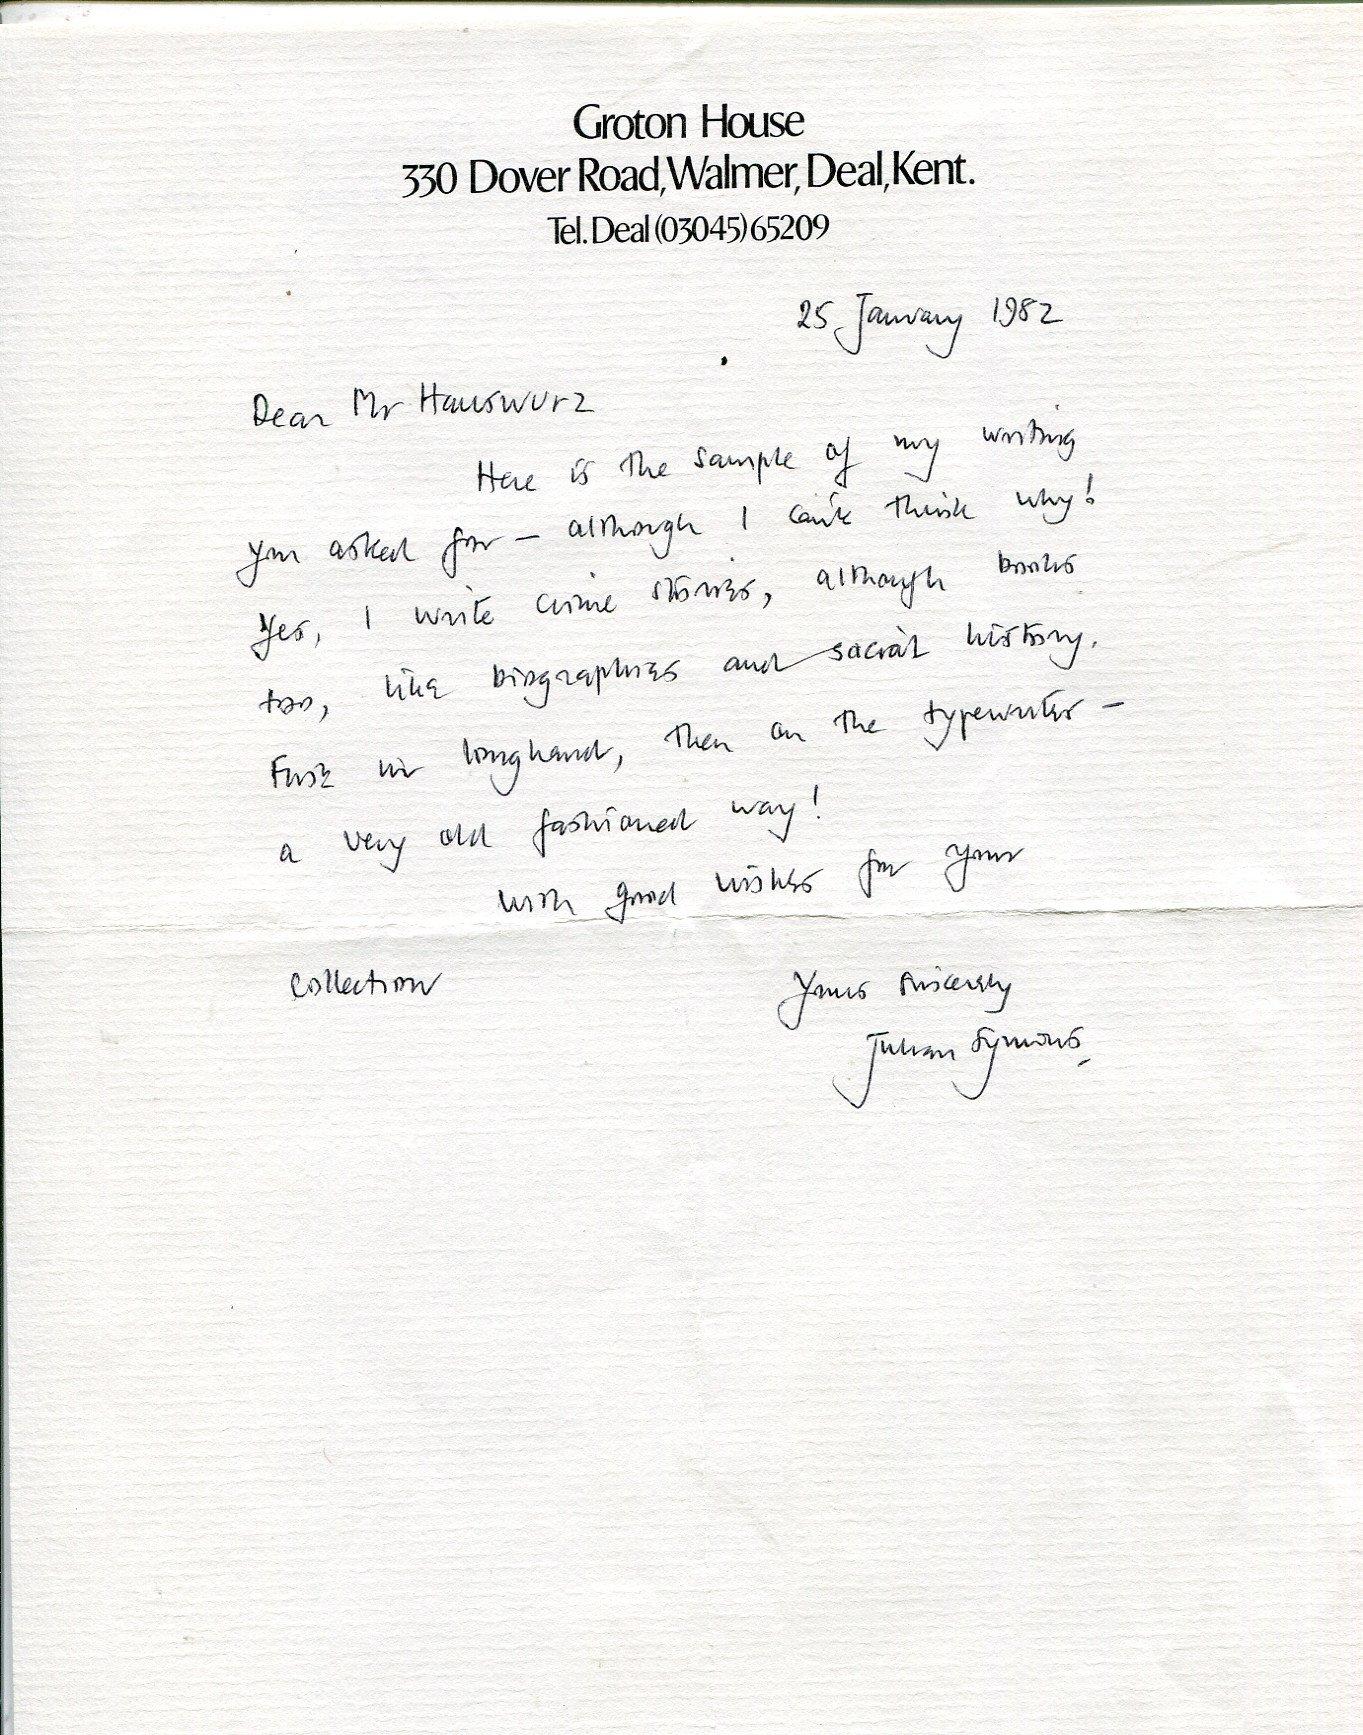 Julian Symons autograph, British crime writer, handwritten letter